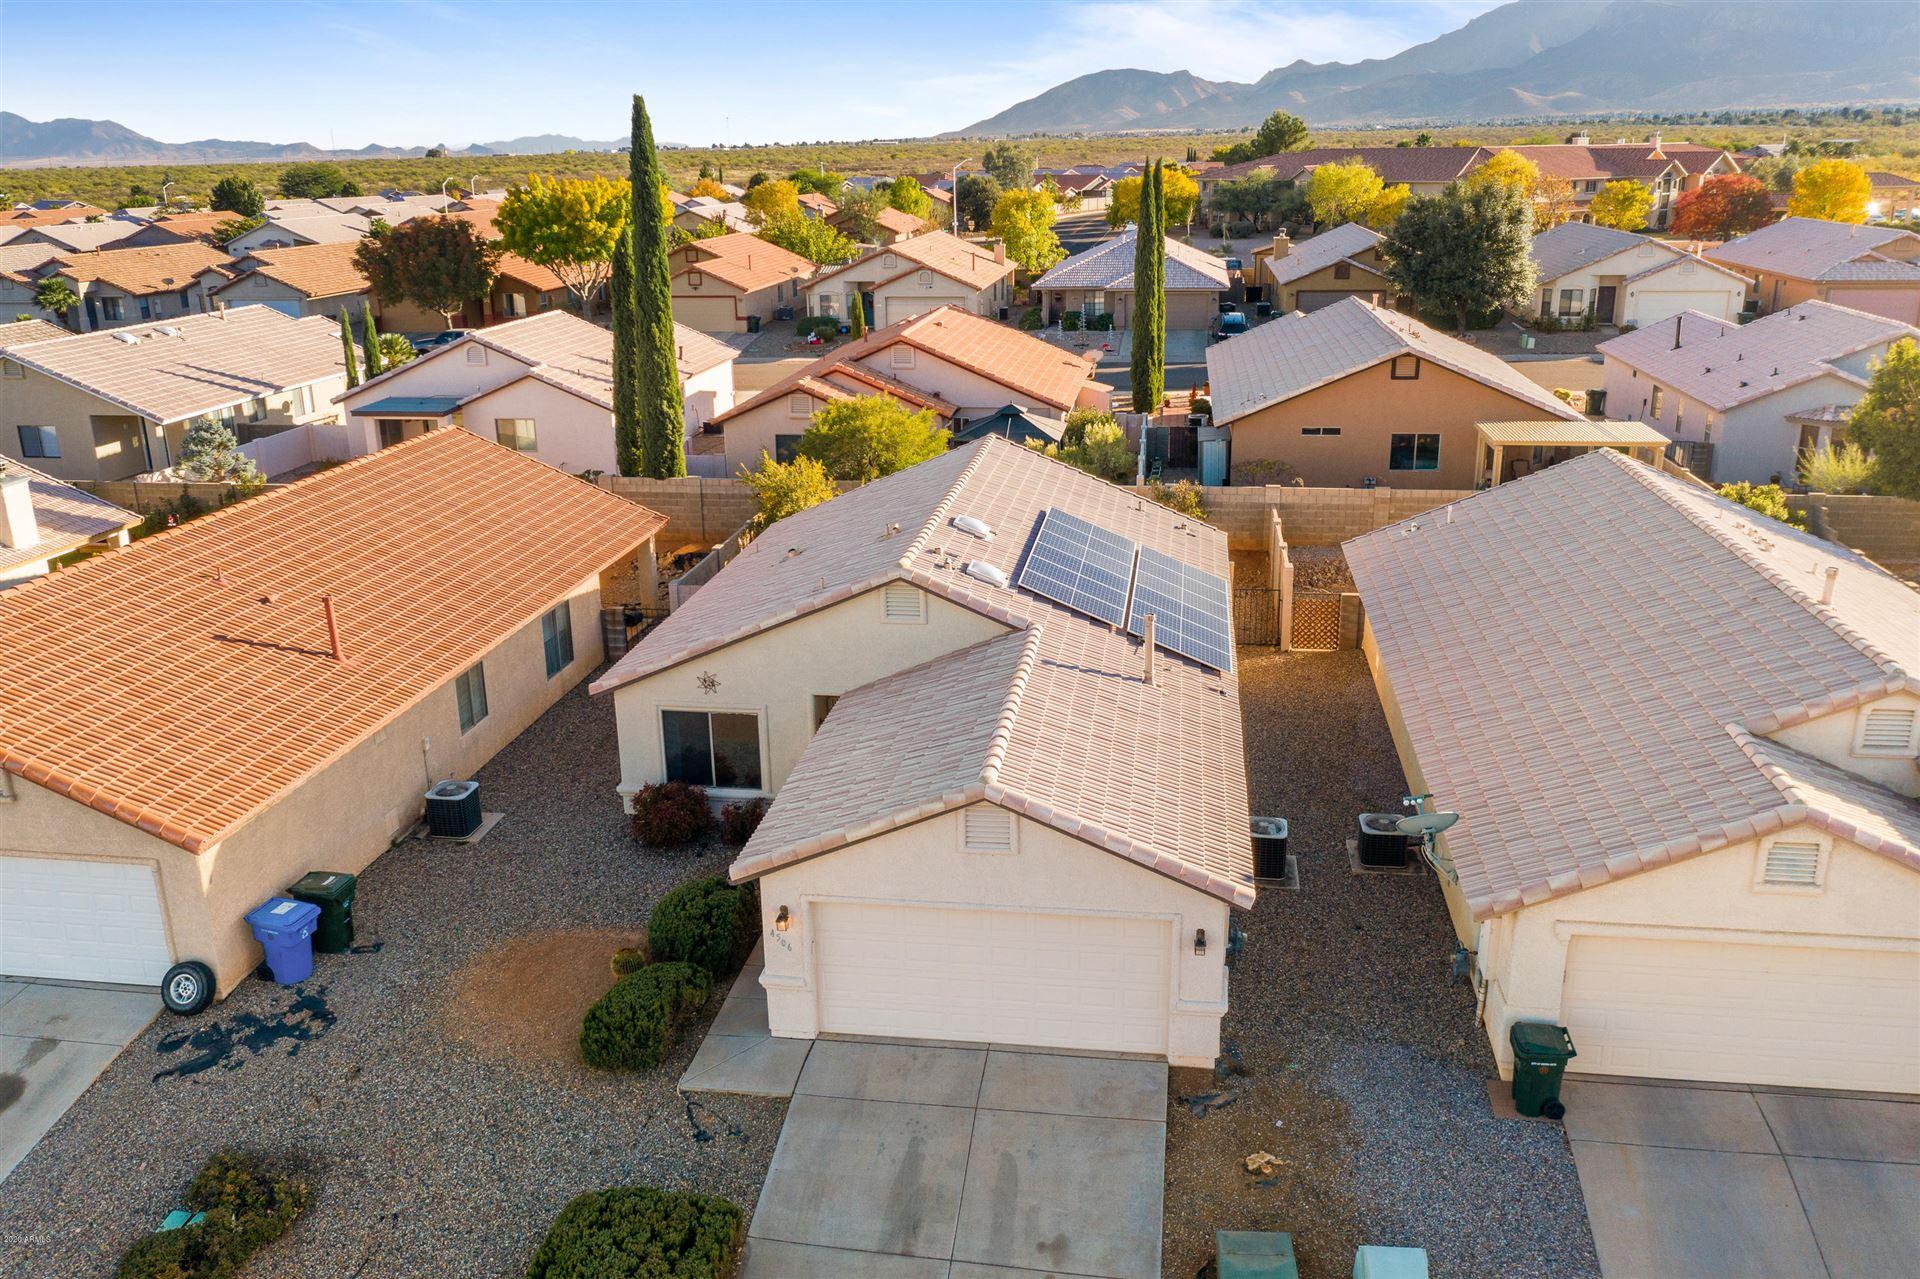 4506 Calle Vista, Sierra Vista, AZ 85635 - #: 6169492